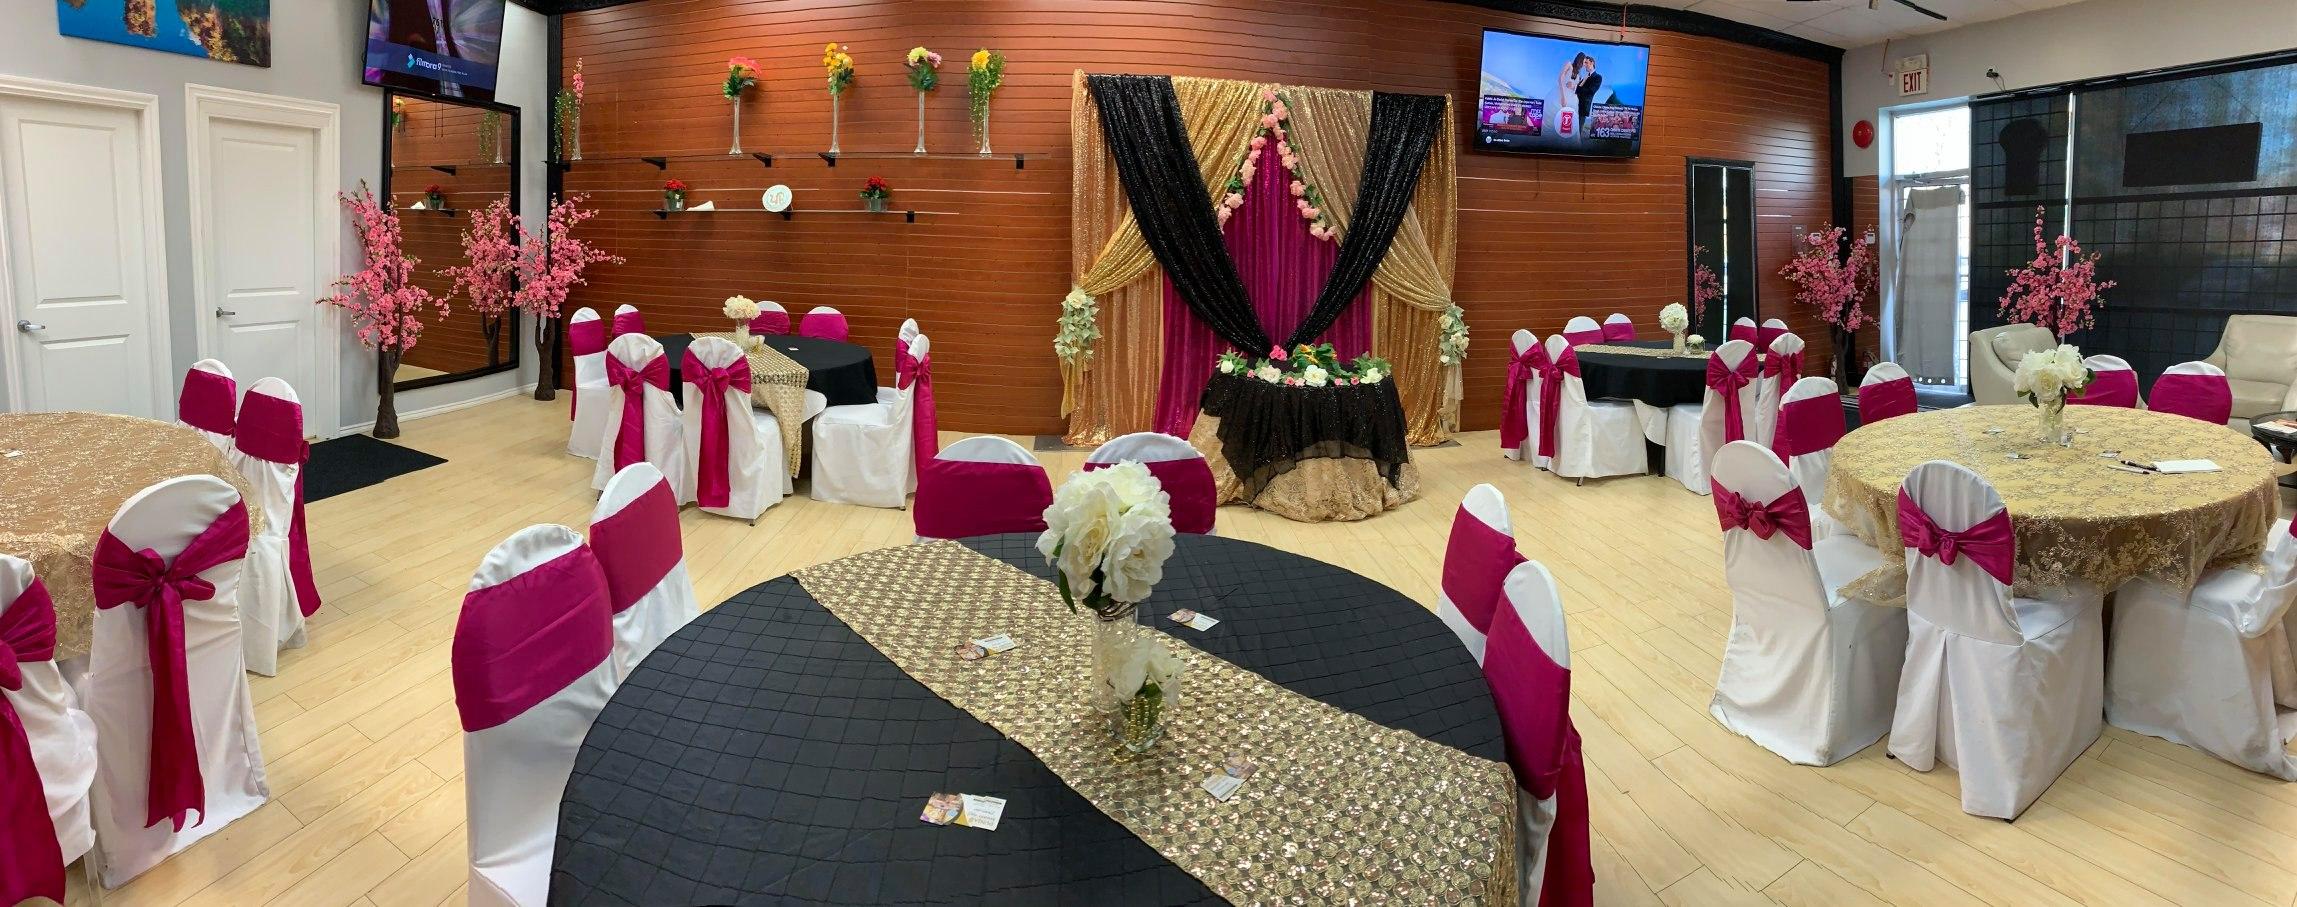 Punjab Banquet Hall